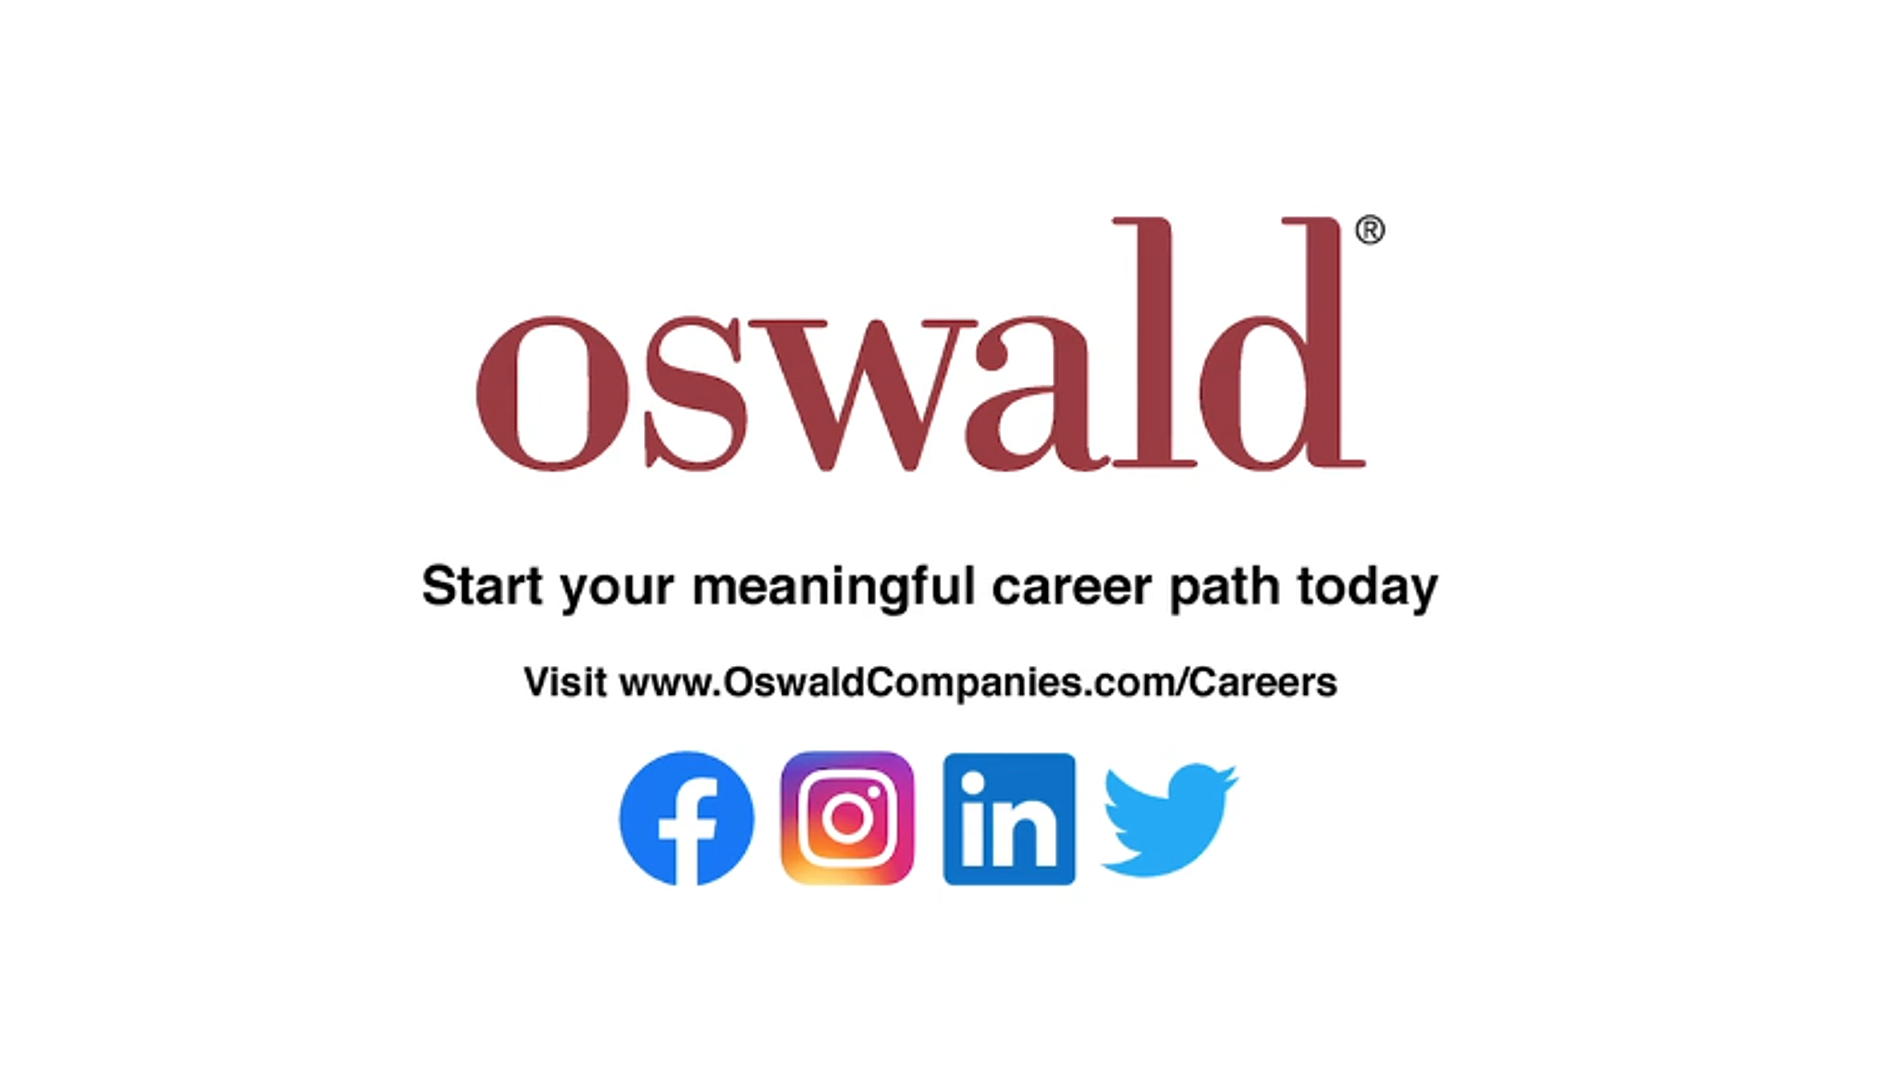 Careers with Oswald Companies